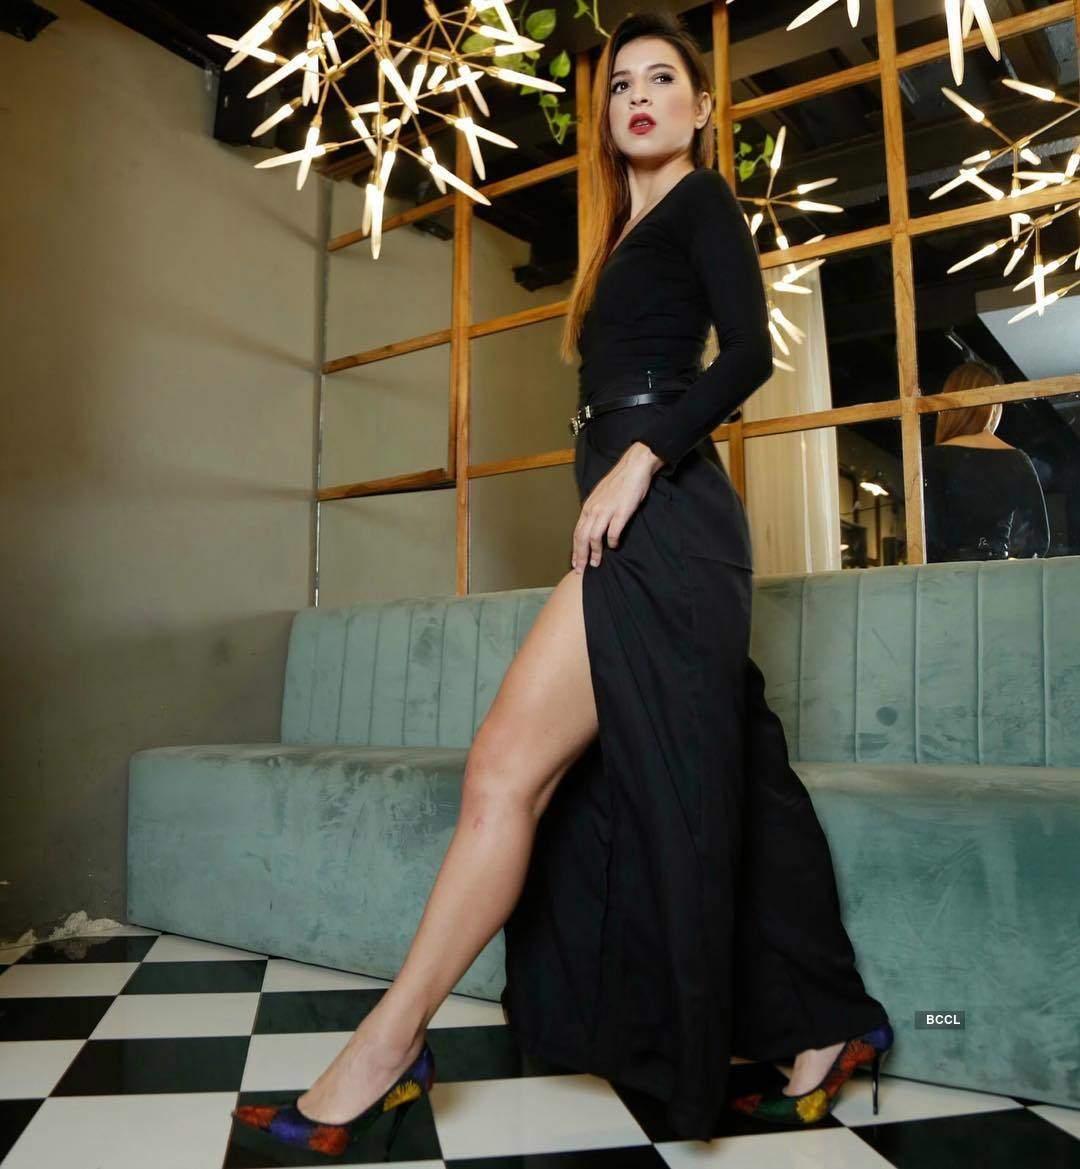 Pictures of the stylish MTV VJ & former Bigg Boss contestant Benafsha Soonawalla